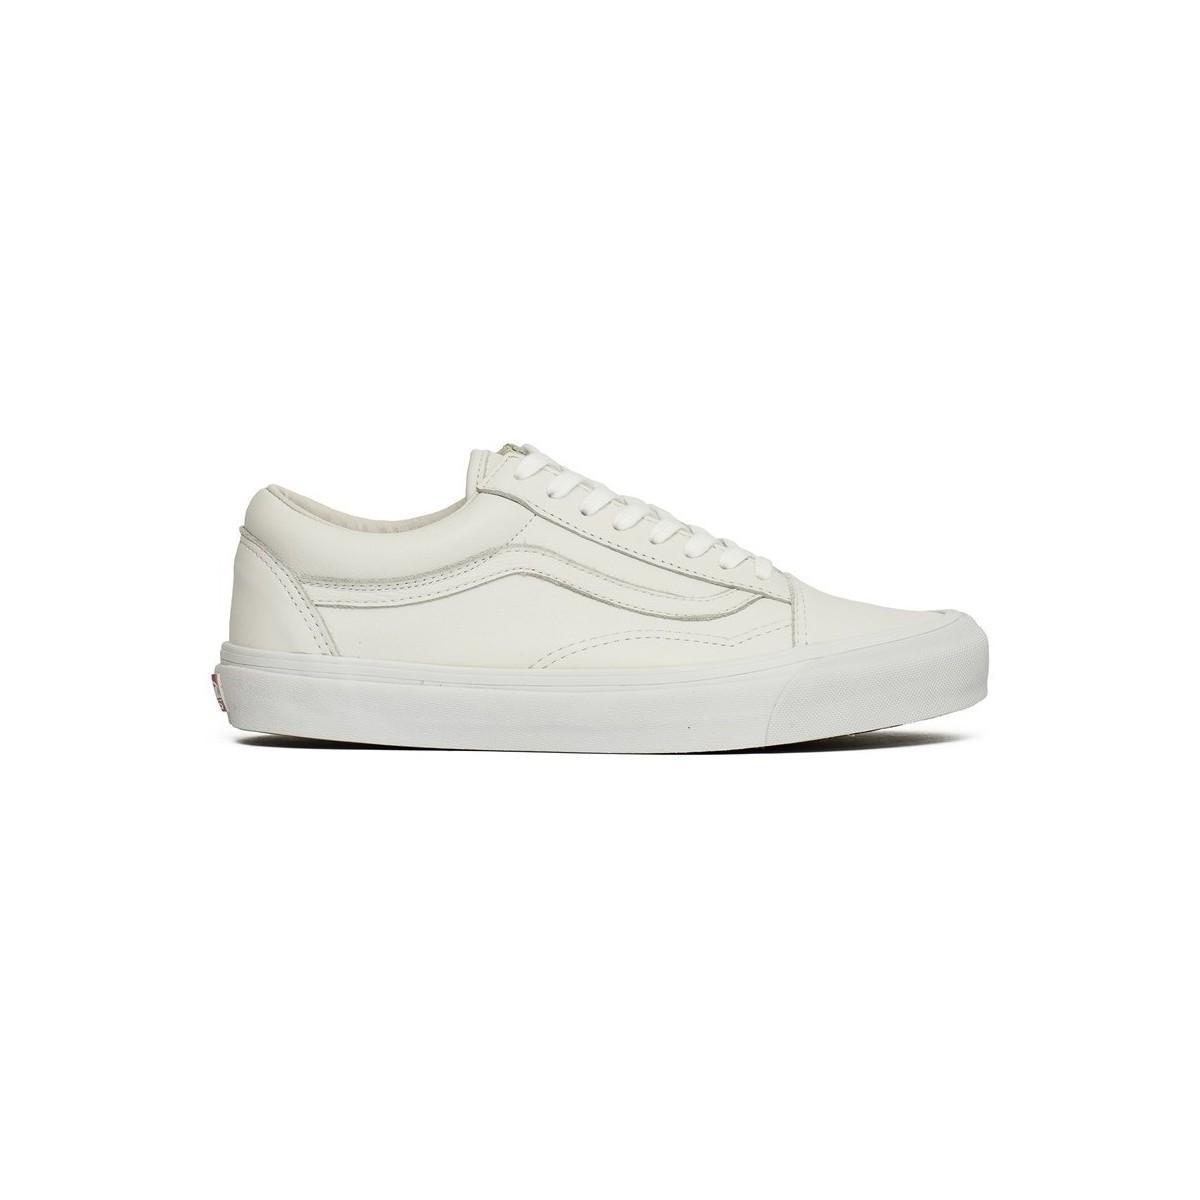 62cf872a76 Vans Vault Og Old Skool Lx Men s Shoes (trainers) In White in White ...